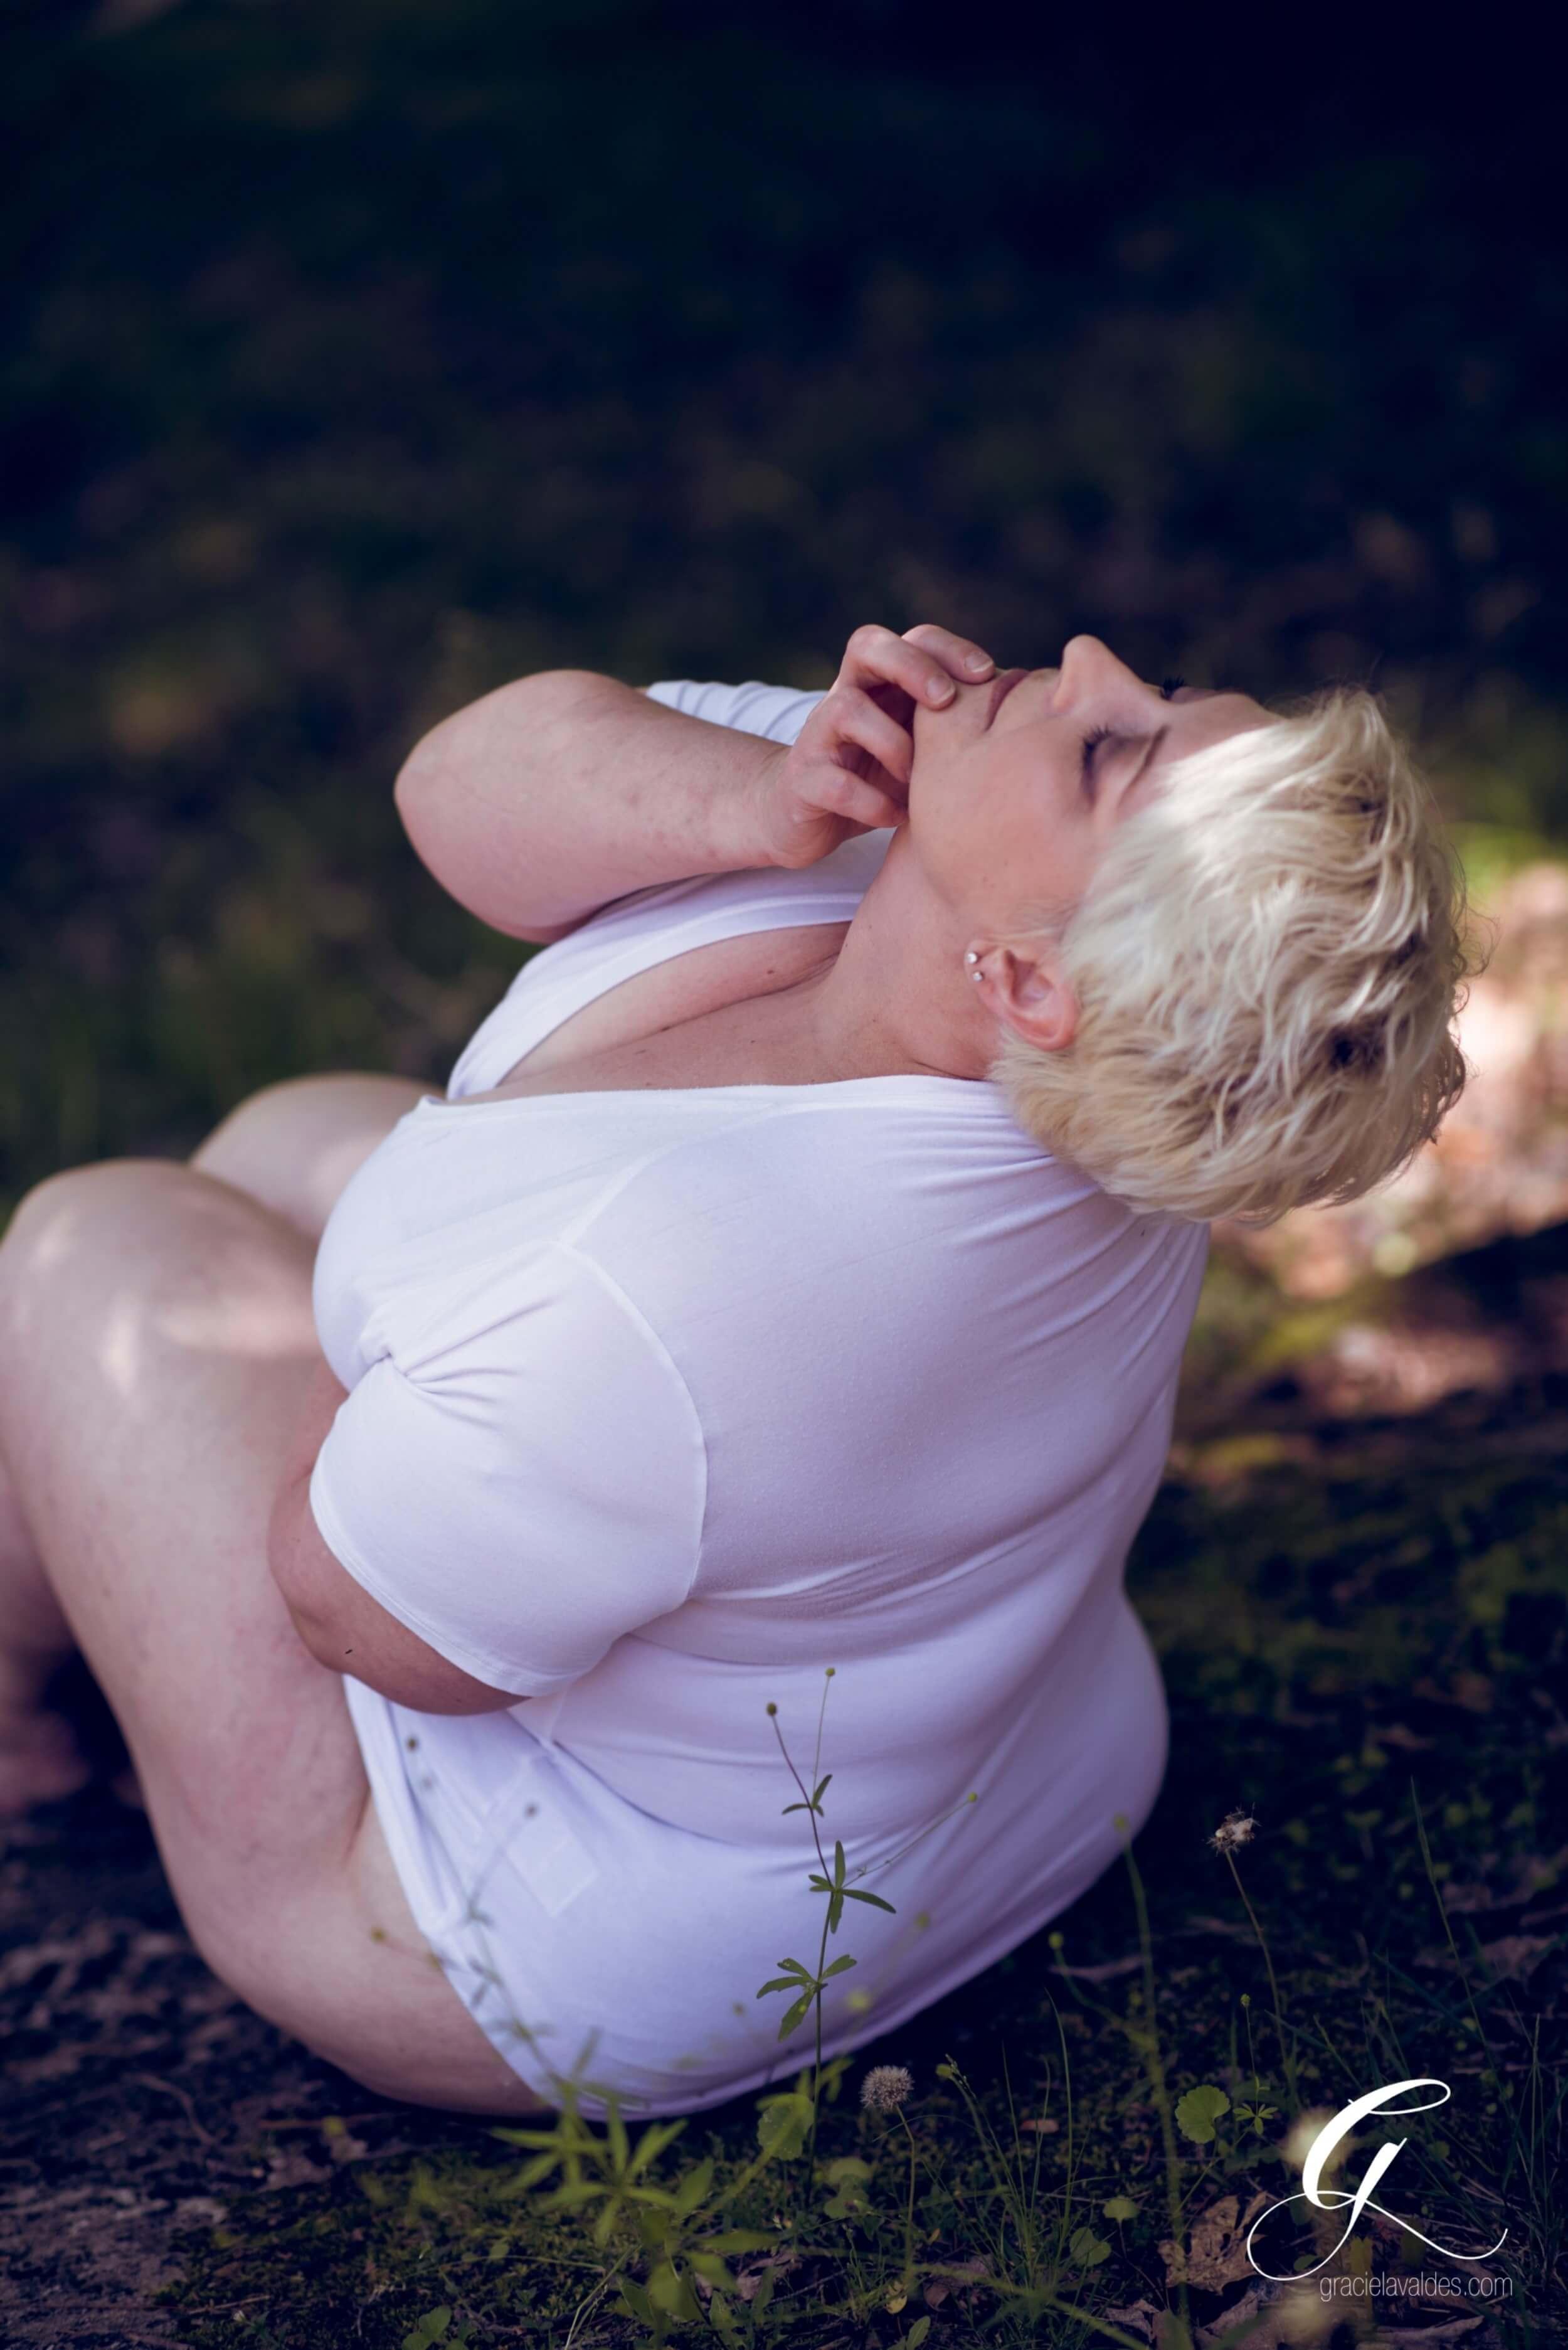 Plus Sized Blonde Boudoir by Graciela Valdes 4.jpg